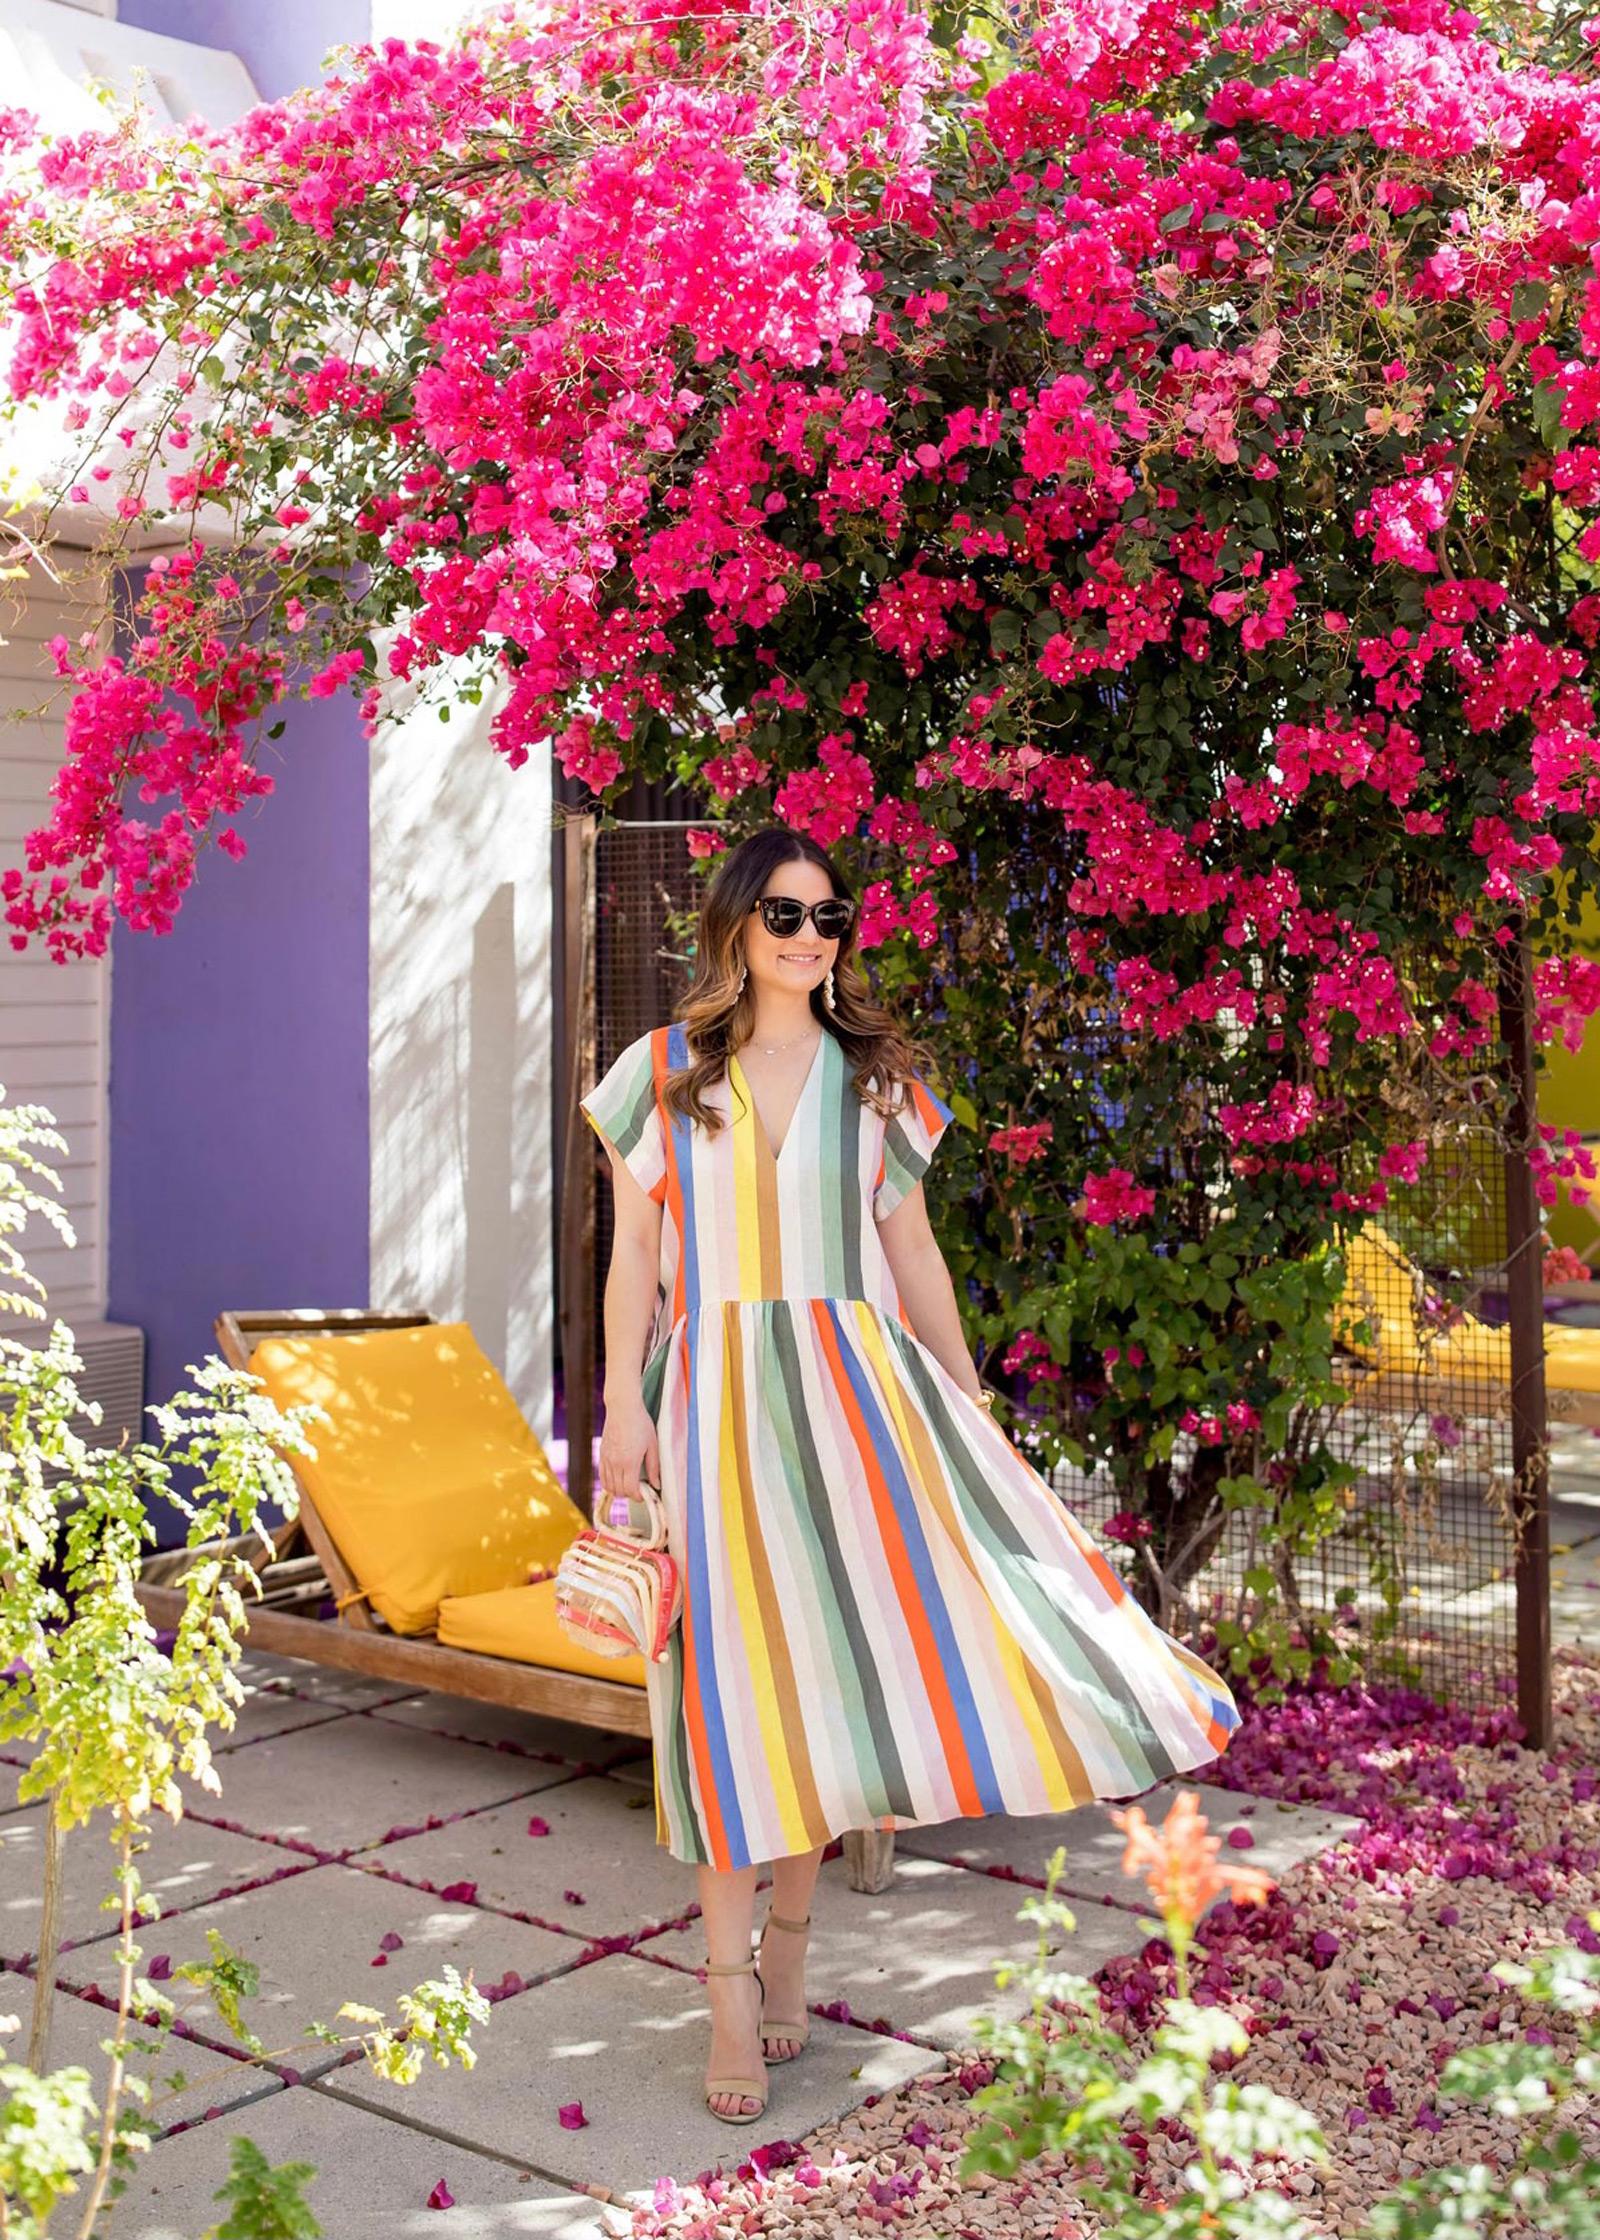 Whit Two Striped Dress